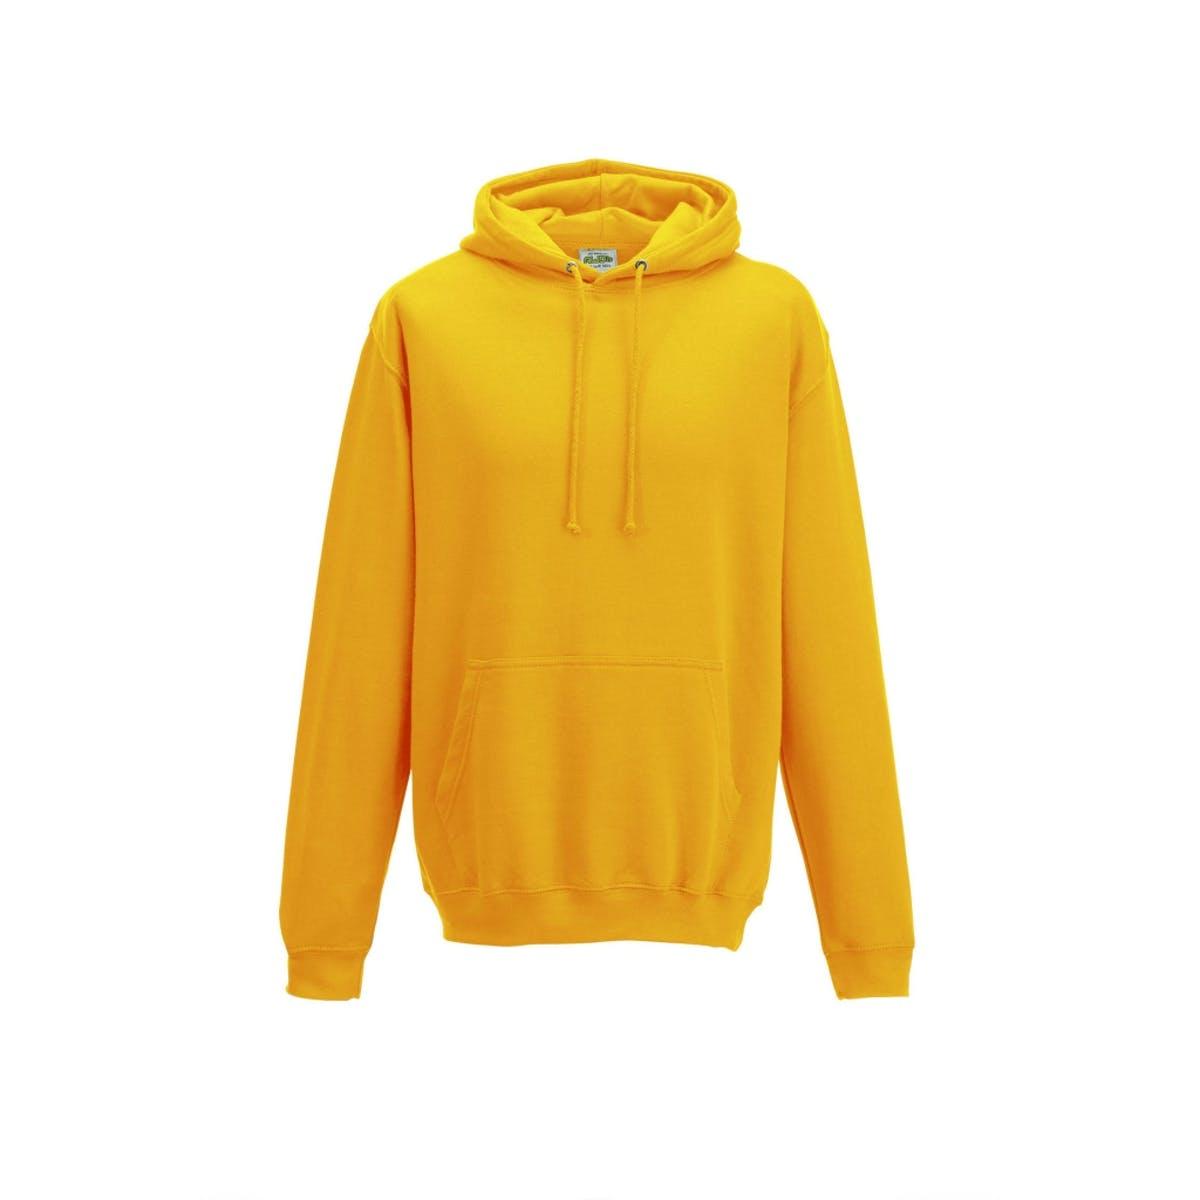 gold college hoodies